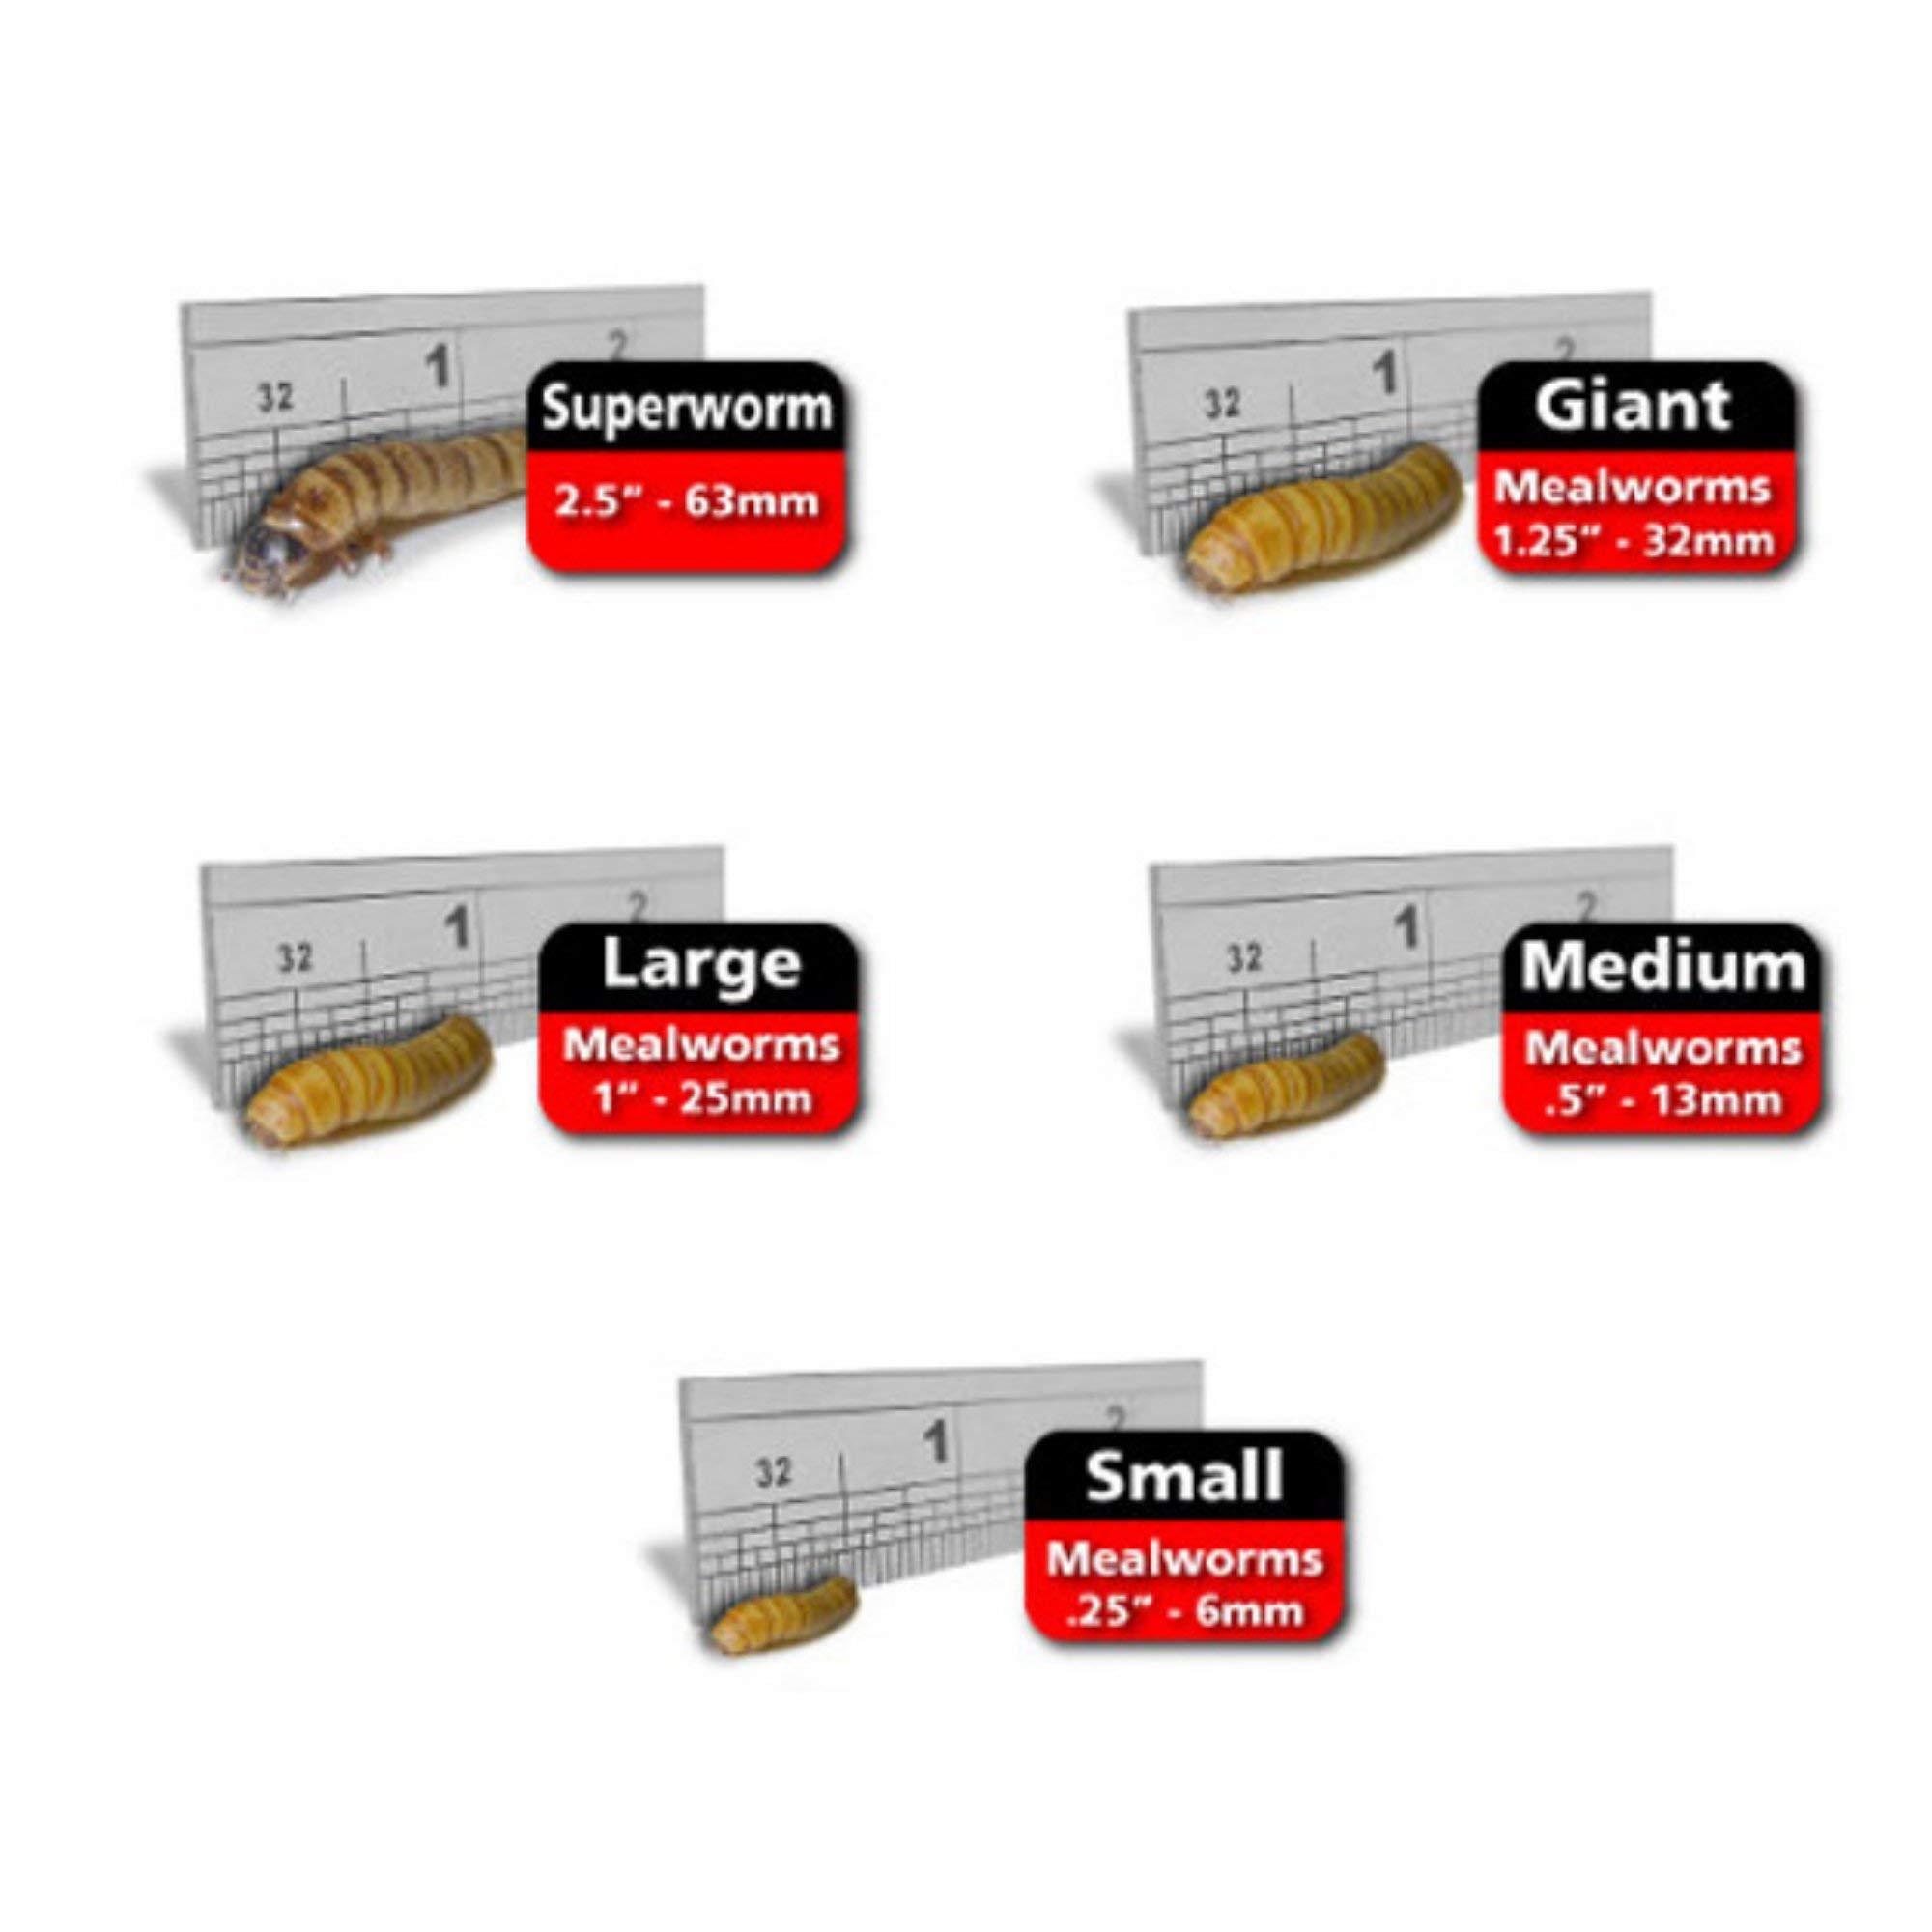 Predator Foods Bulk Super Worms - King Worms Medium (1.5 in) - 1000 Count by Predator Foods